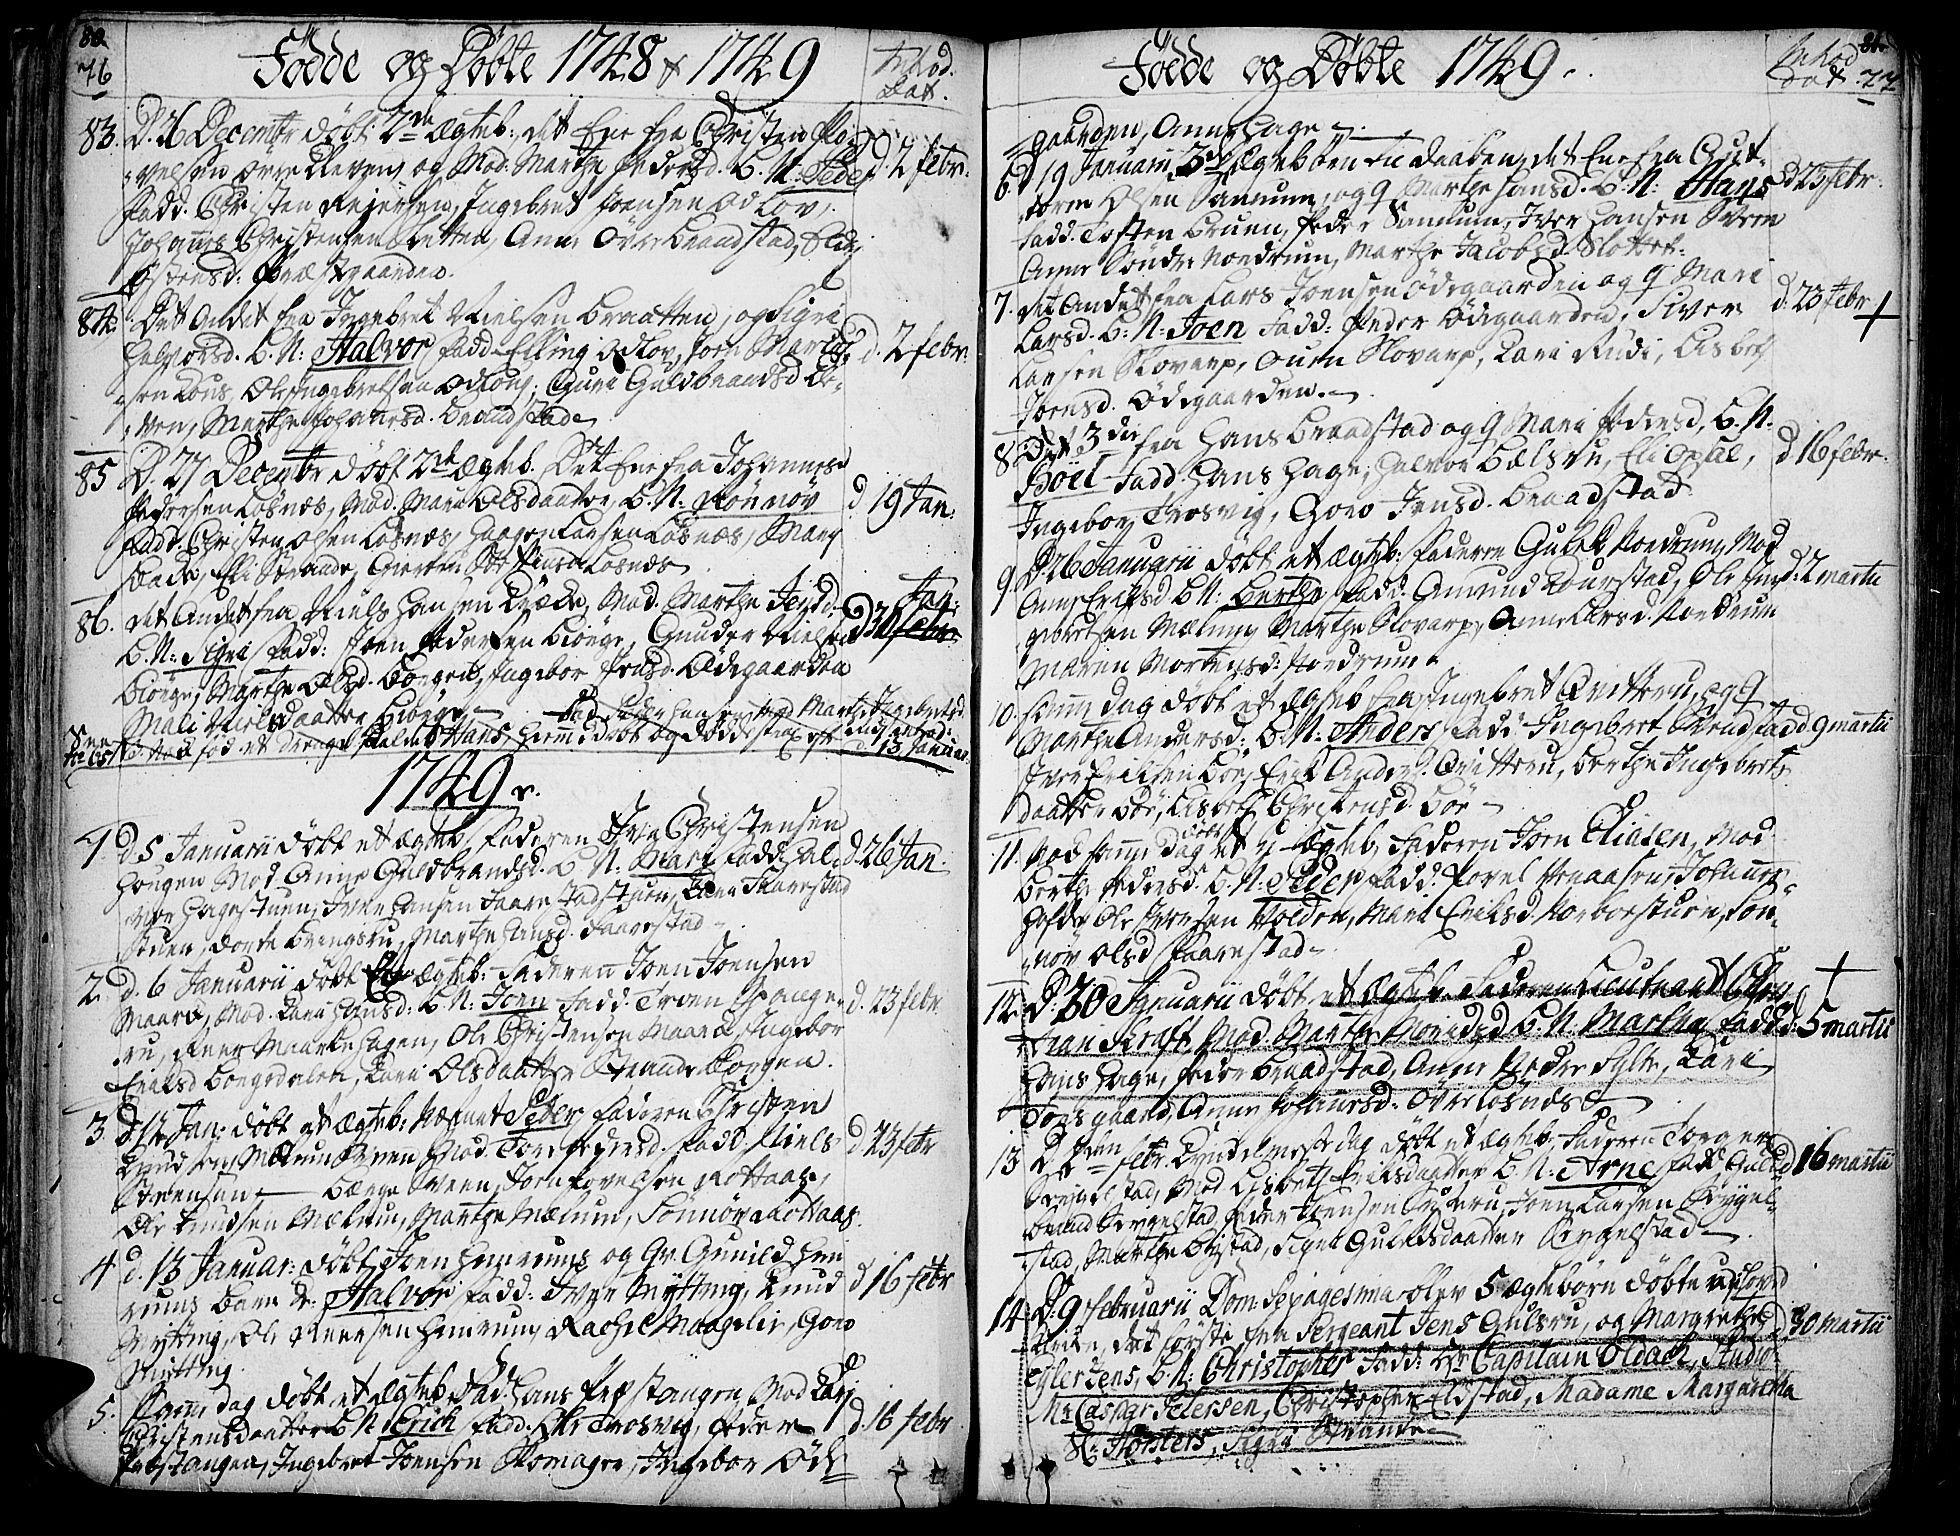 SAH, Ringebu prestekontor, Ministerialbok nr. 2, 1734-1780, s. 76-77